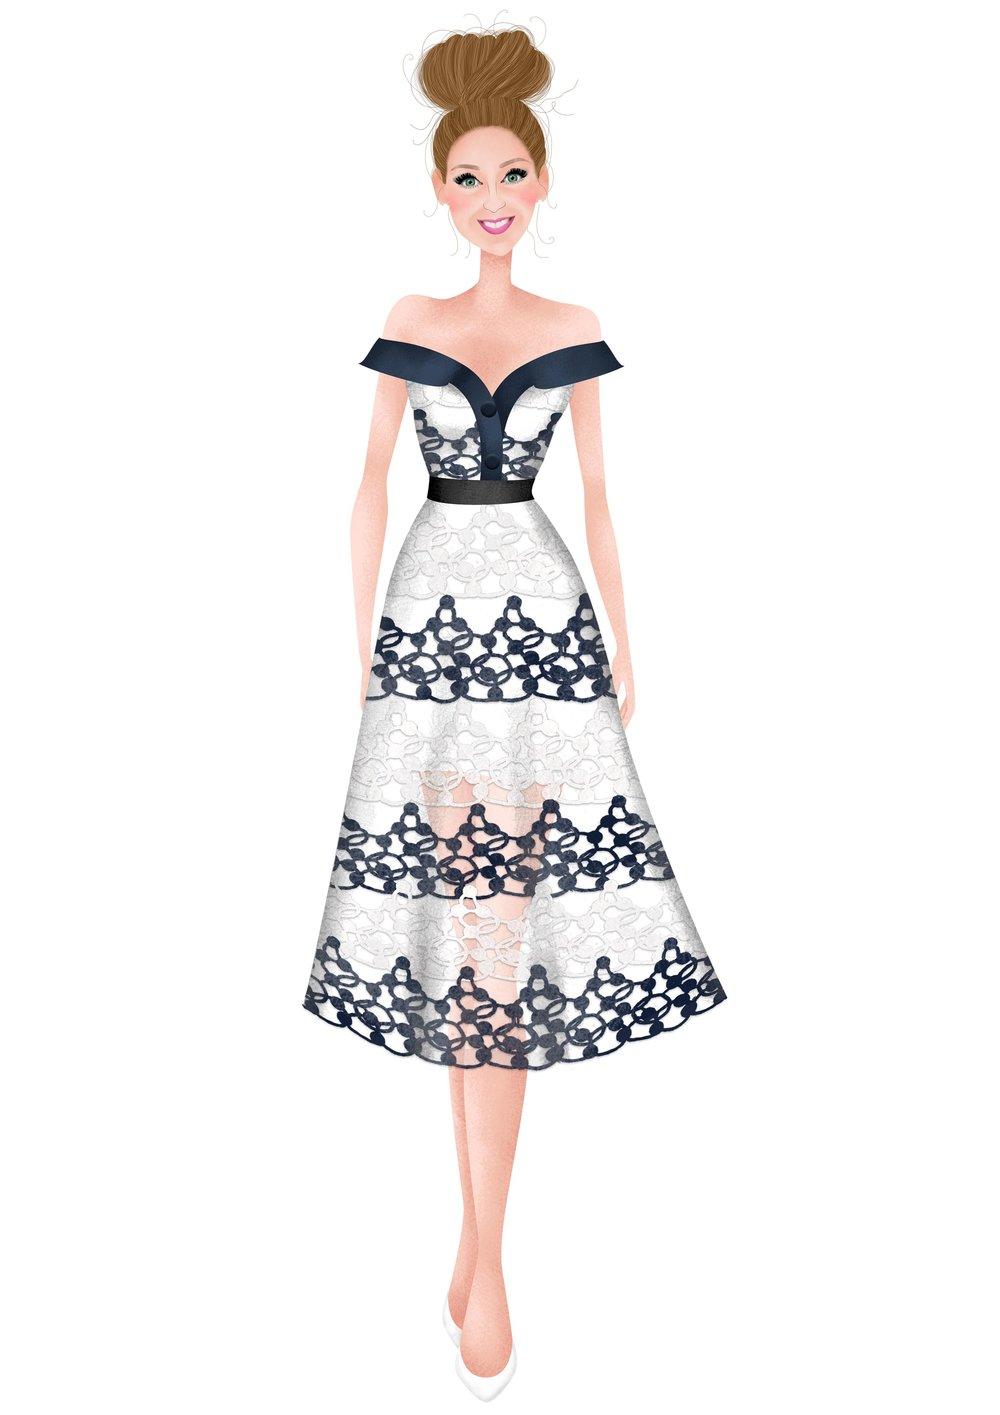 SELF PORTRAIT - DRESS 2 - A4.jpg